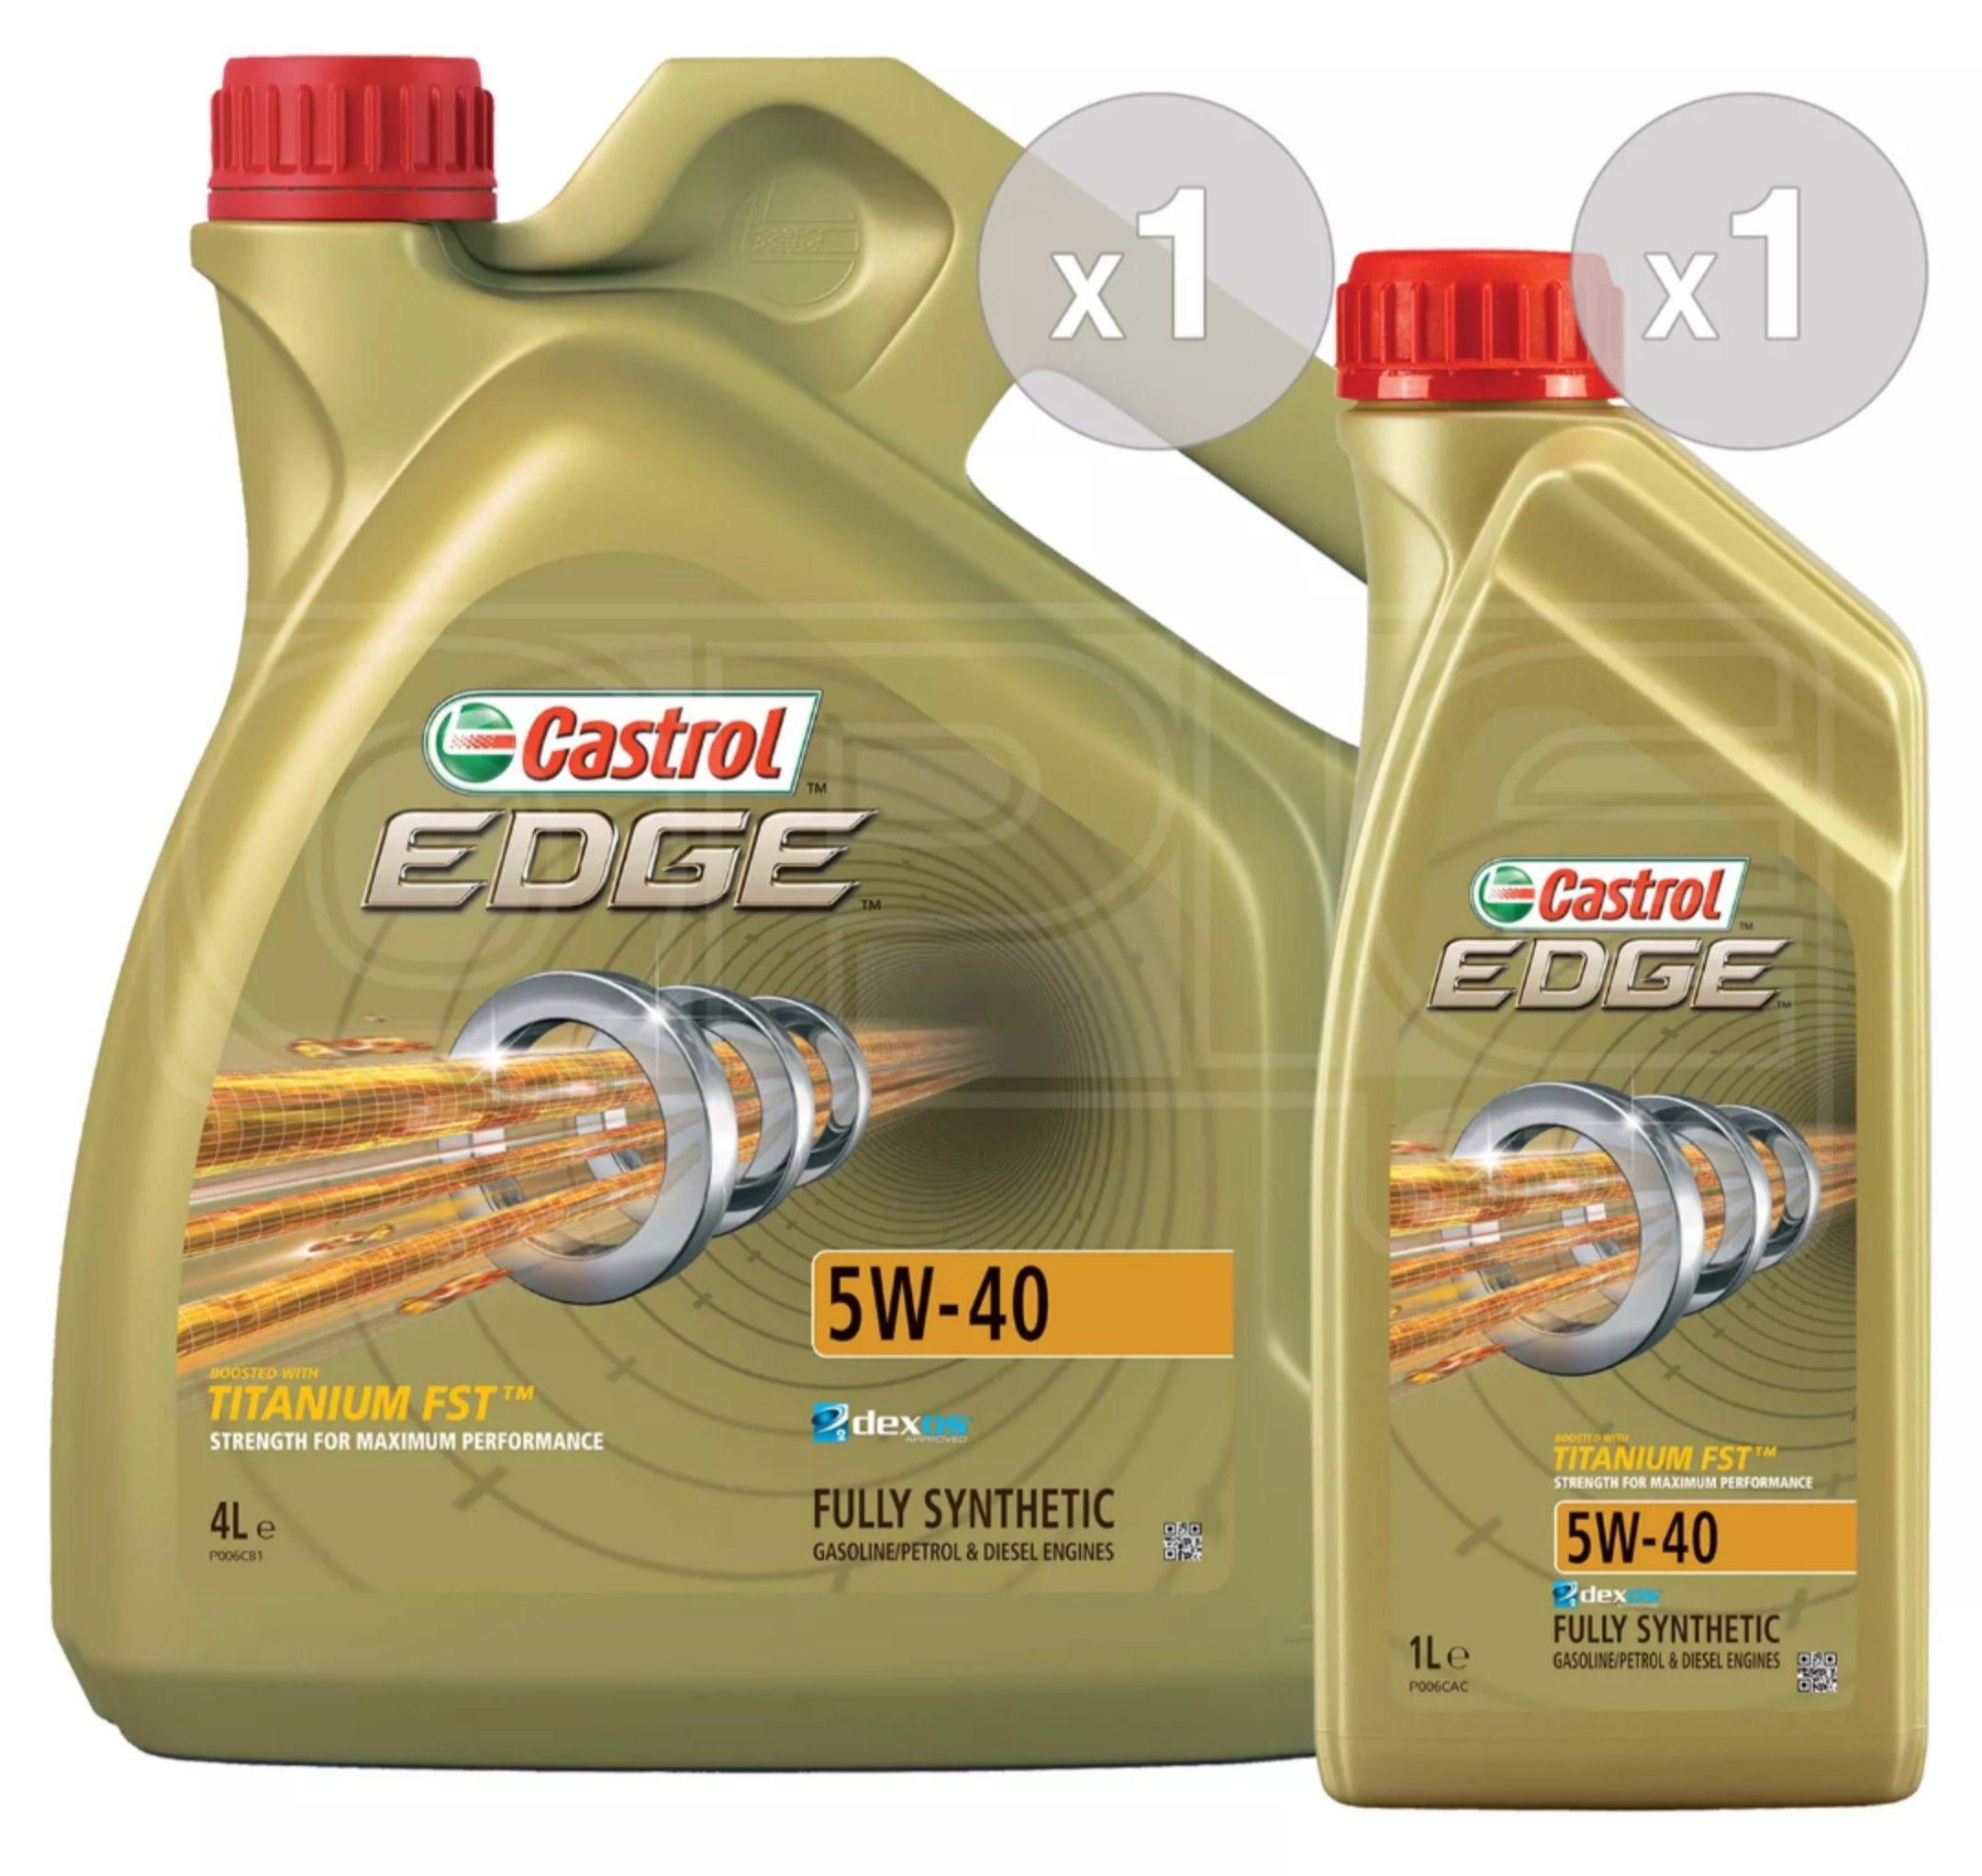 Castrol EDGE TITANIUM 5W-40 Synthetic Engine Oil 5W40 - 5 LITRES (4L + 1L) £36.86 Opie Oils on eBay